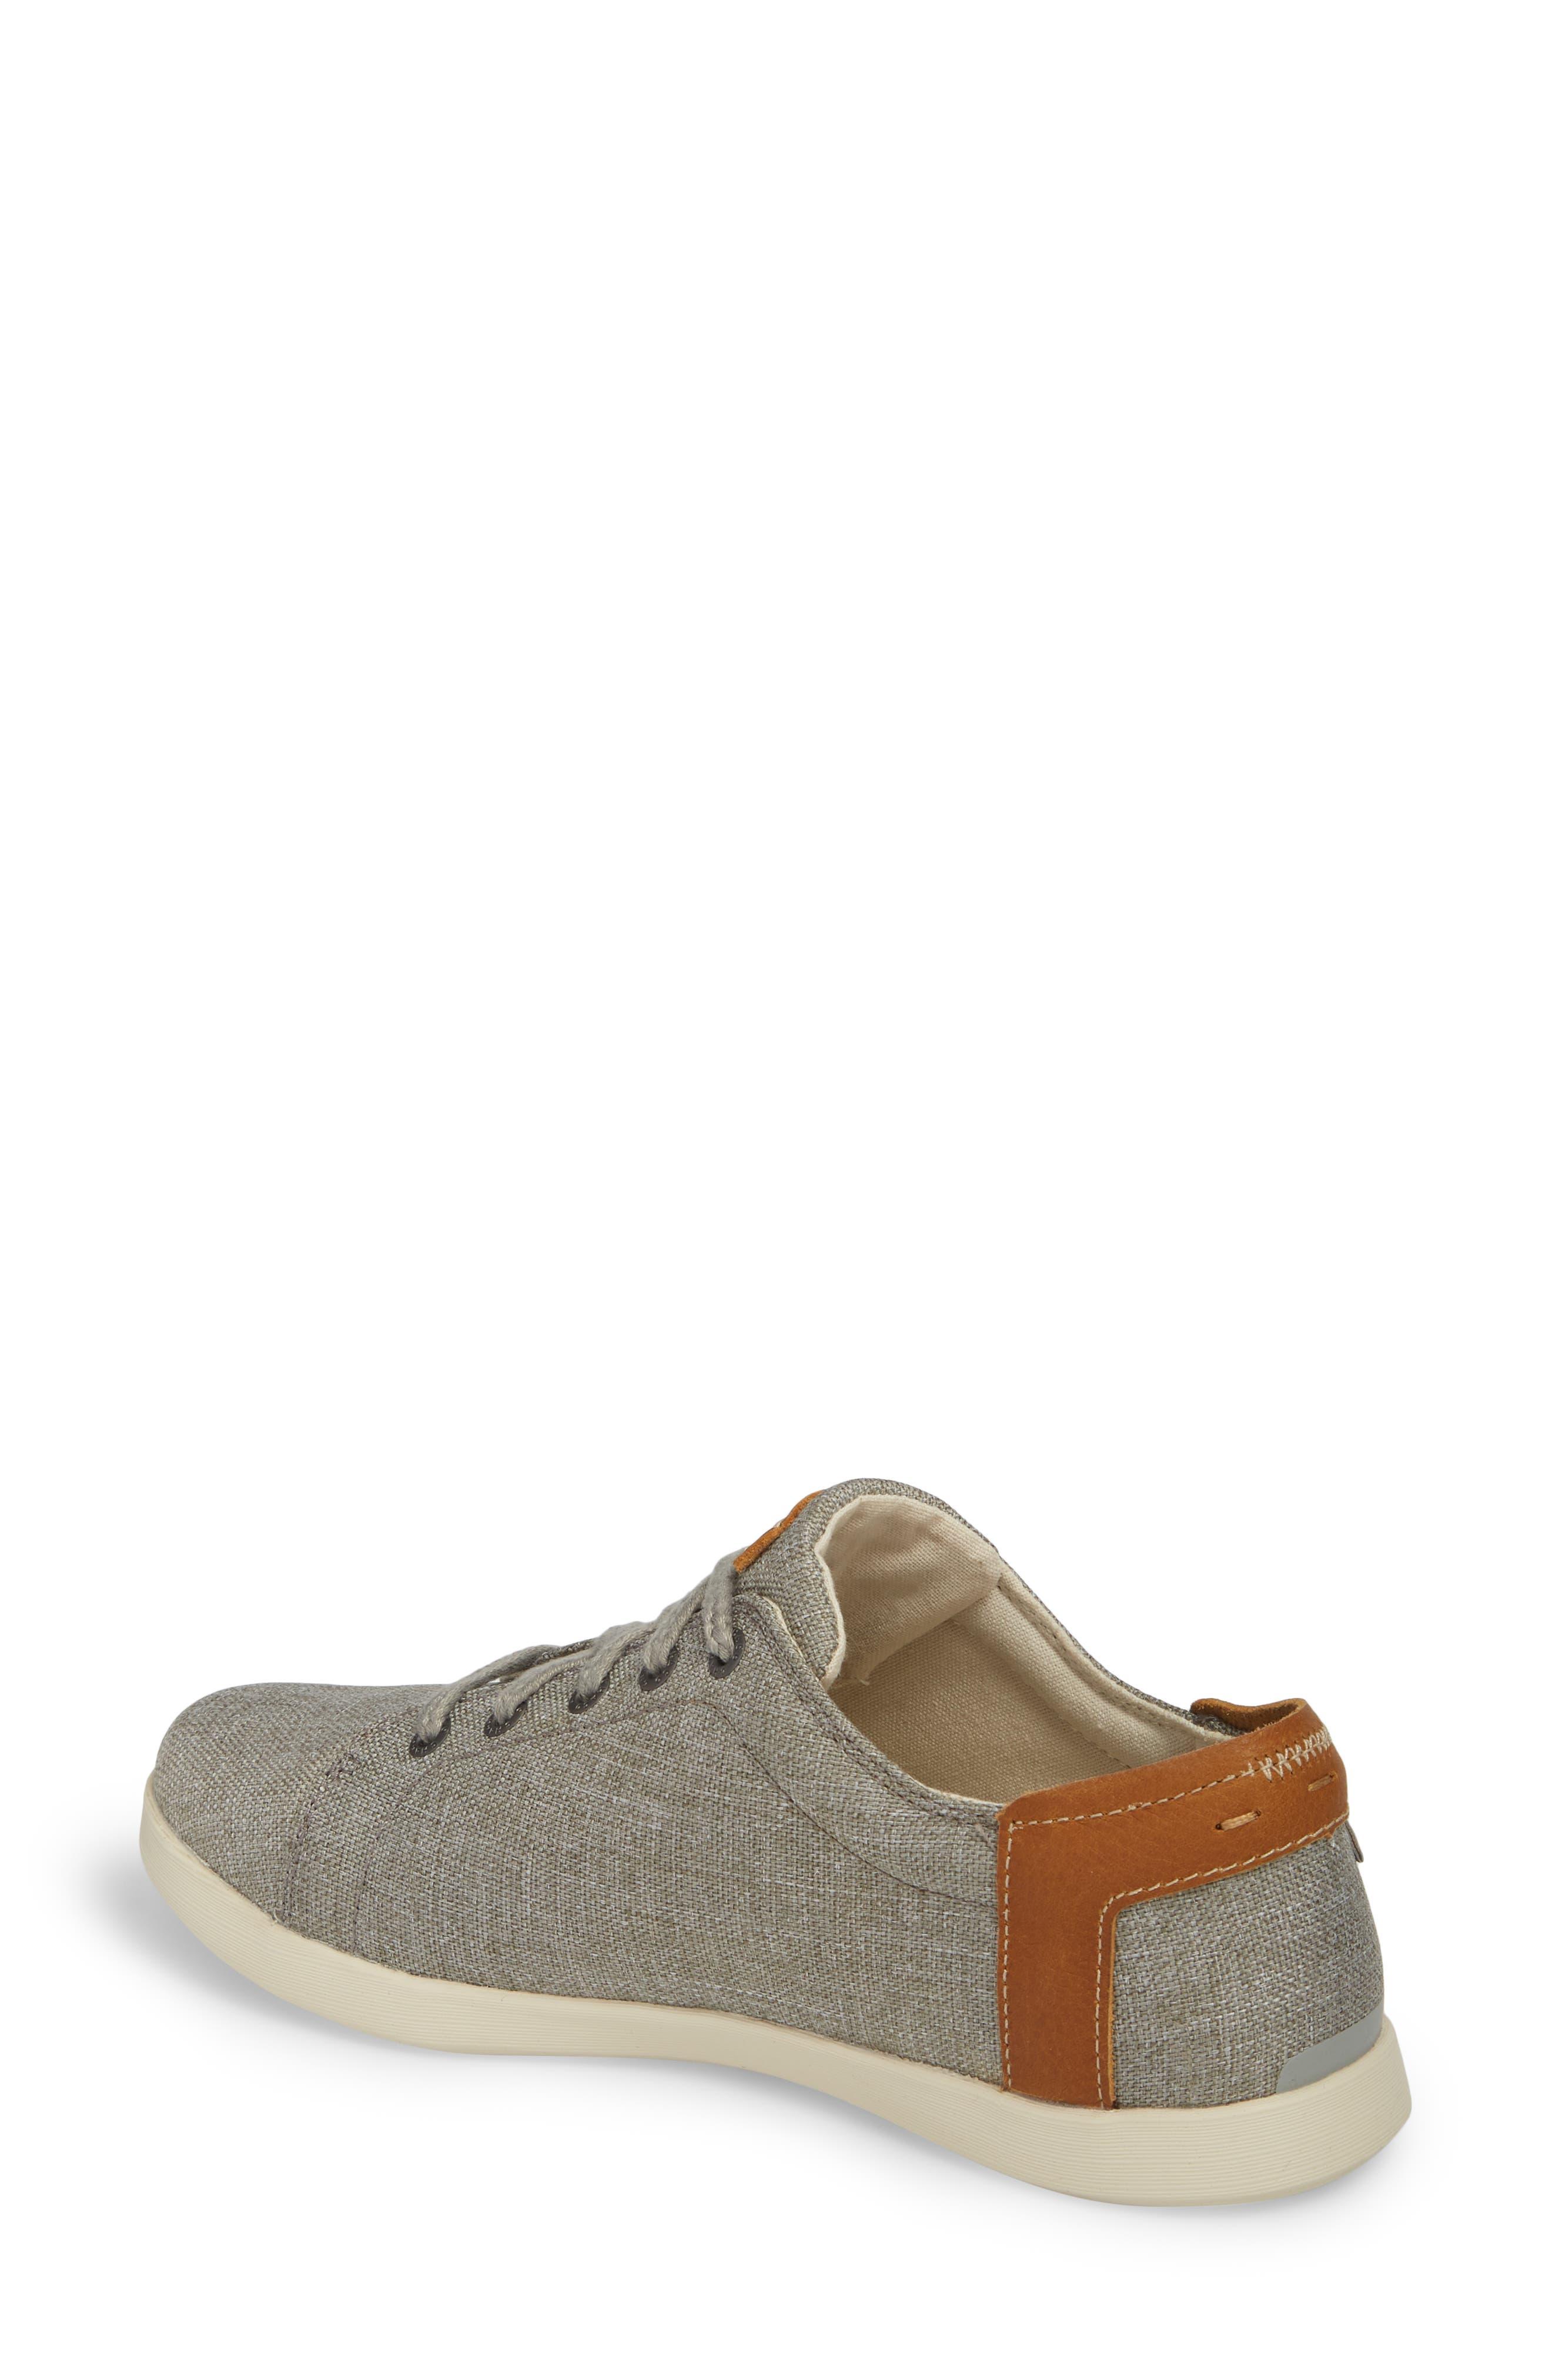 Ionia Sneaker,                             Alternate thumbnail 2, color,                             Gray Canvas